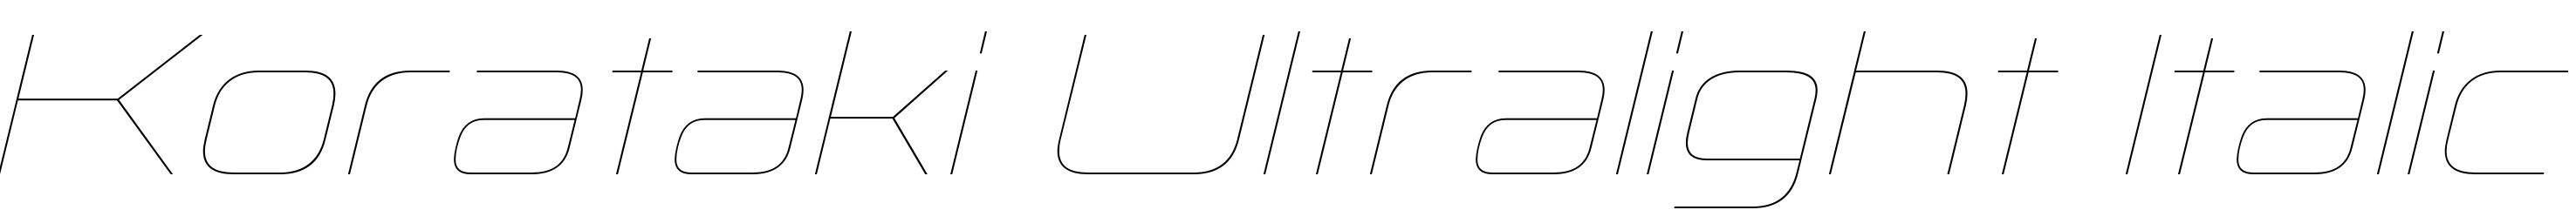 Korataki Ultralight Italic